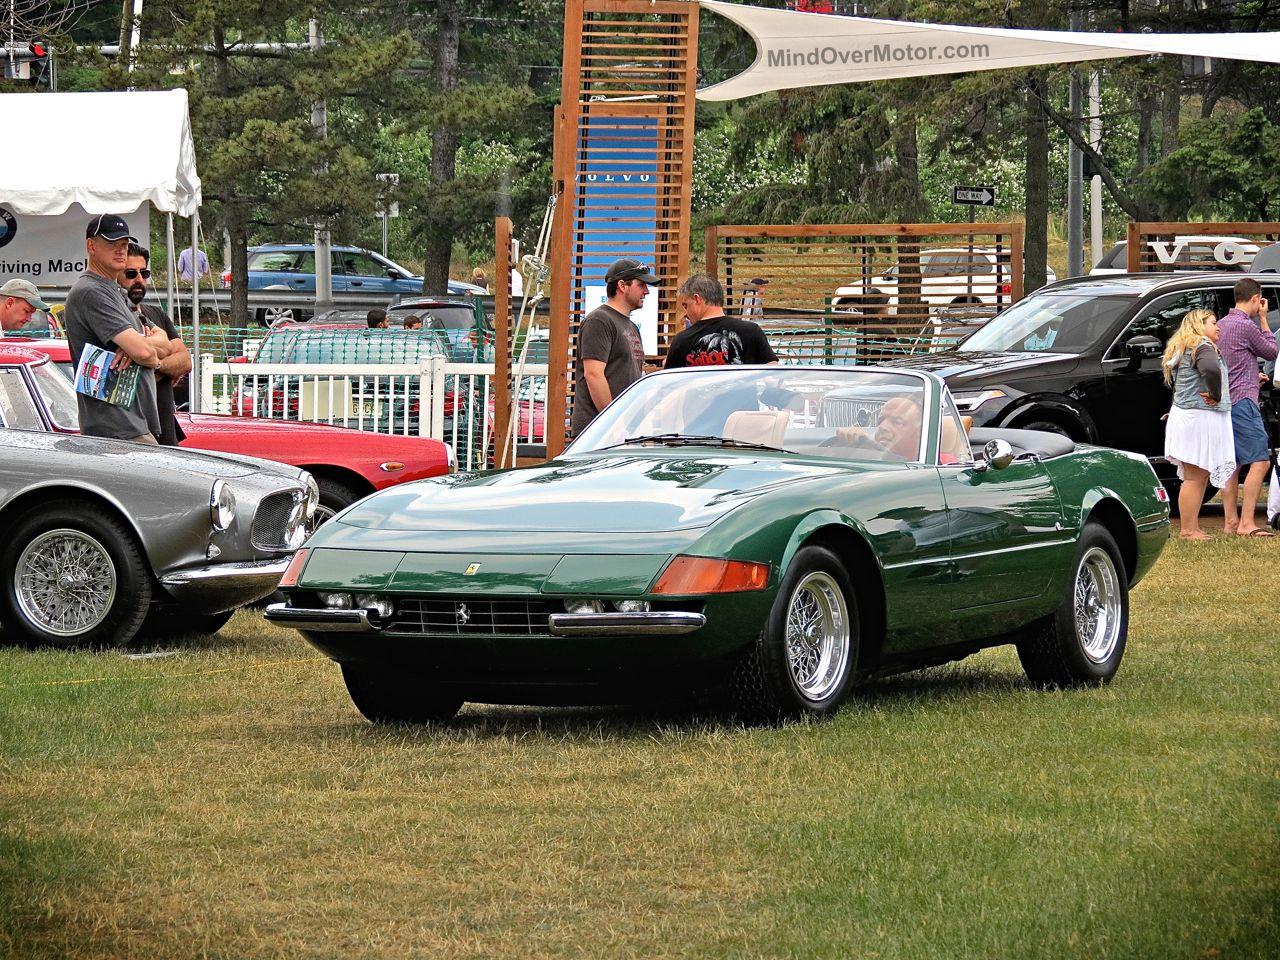 Greenwich 2 Green Ferrari 365 Daytona Spider